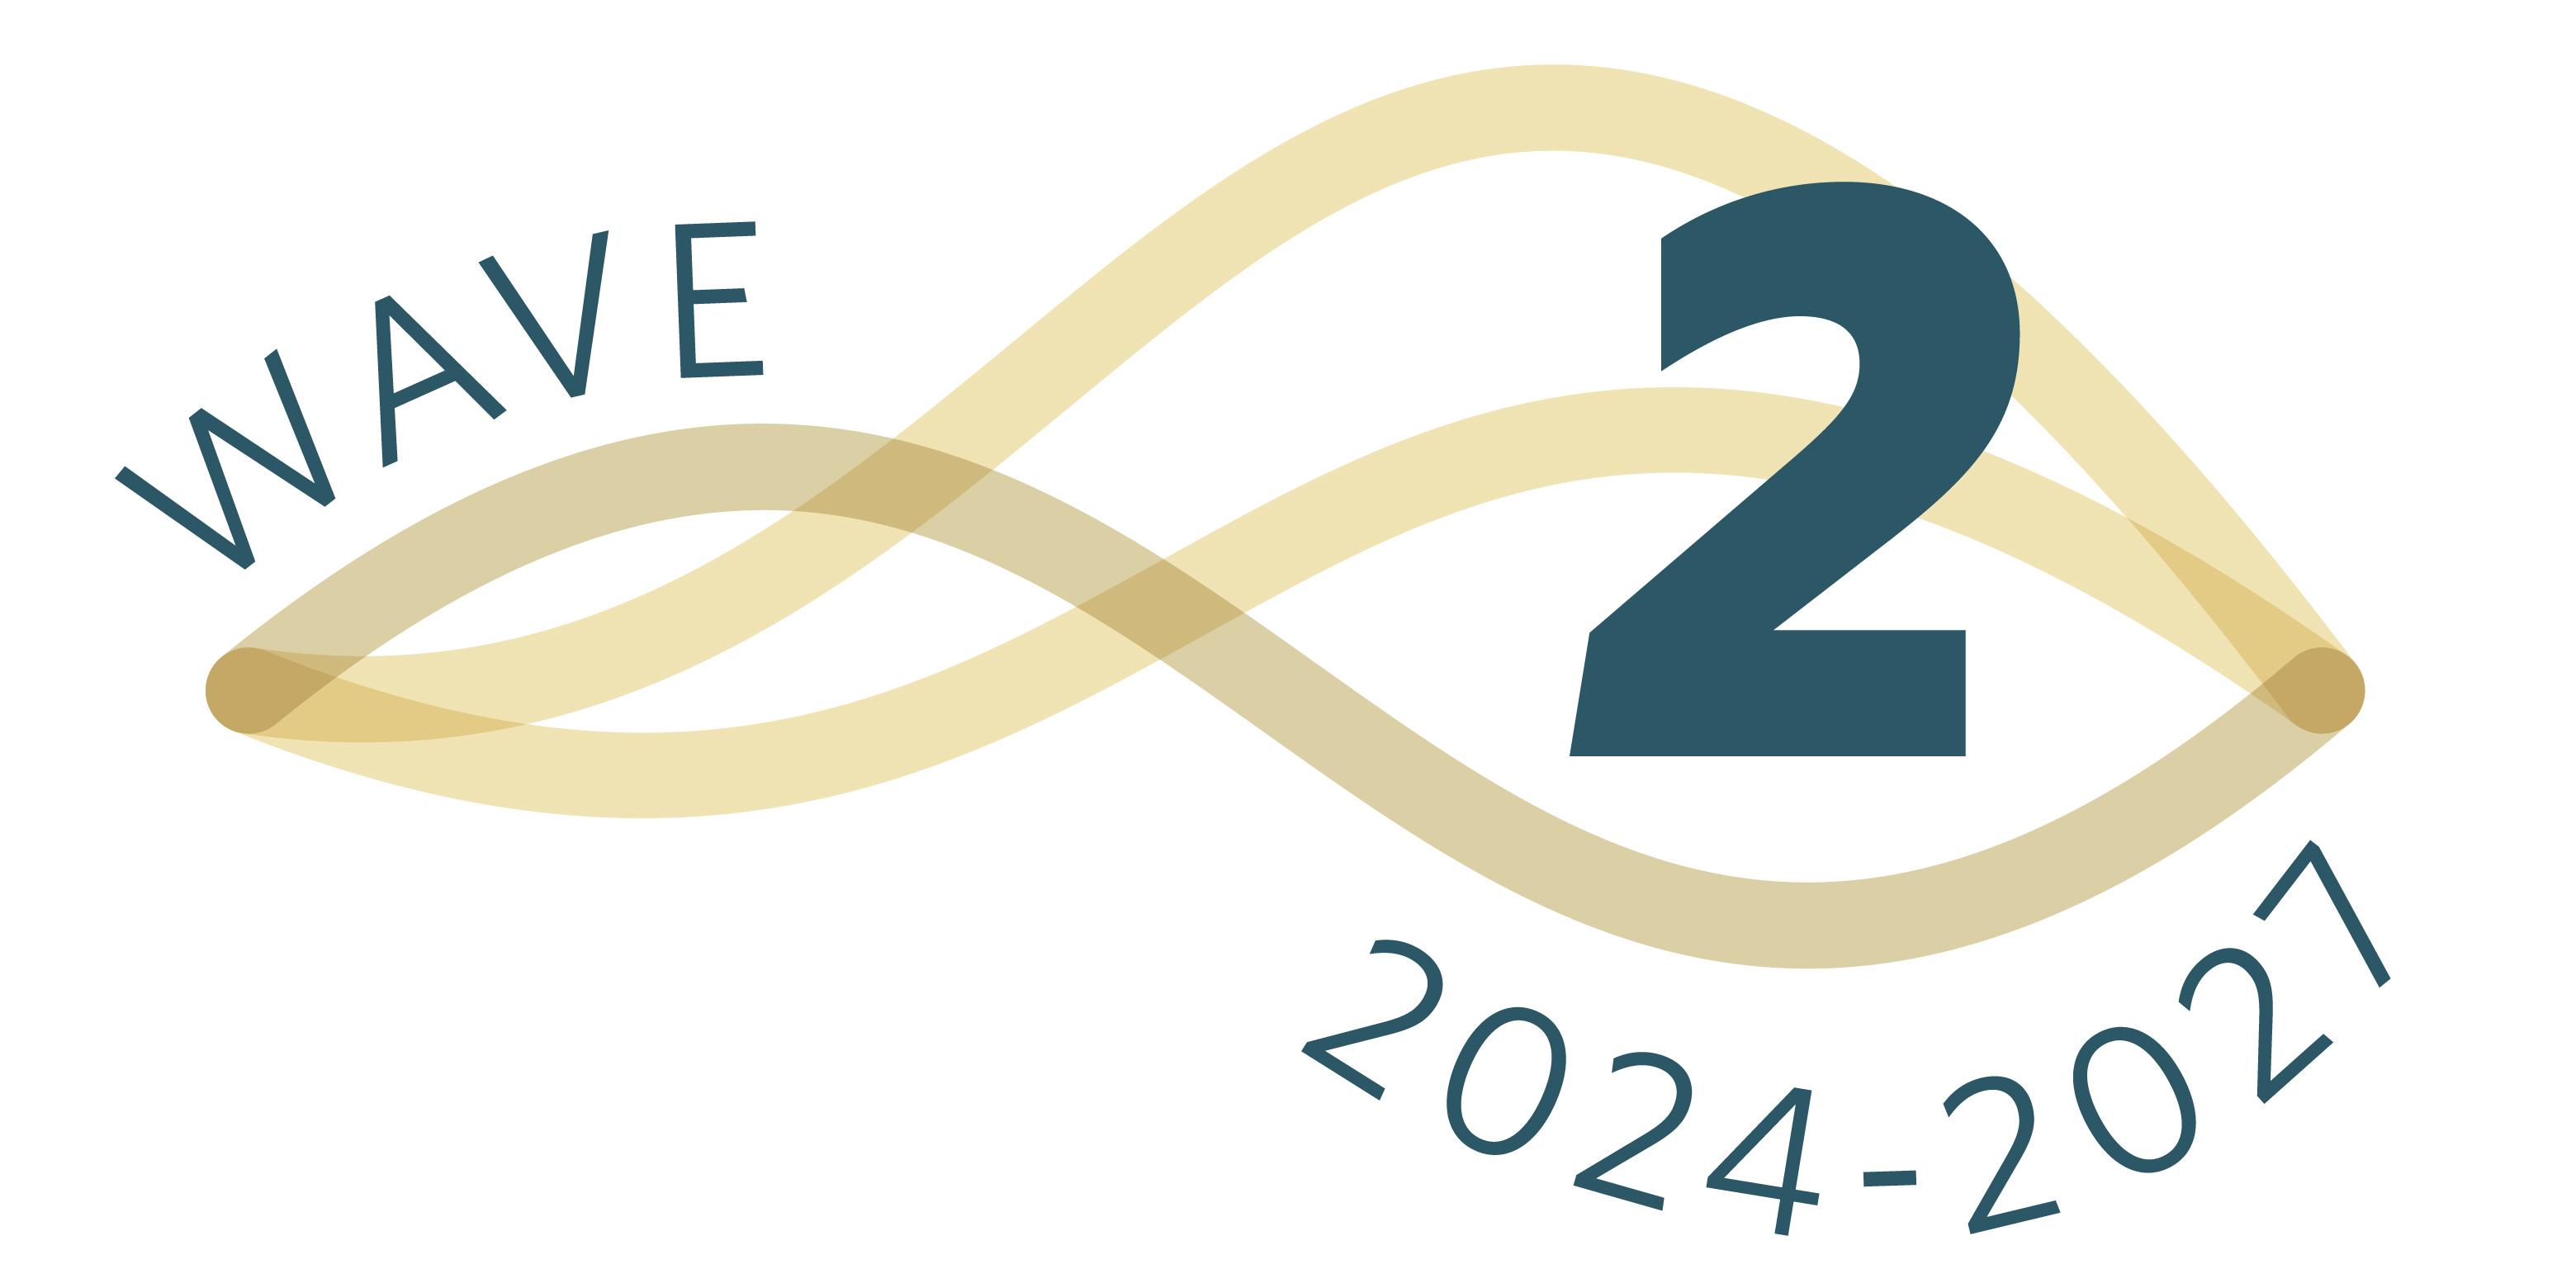 wave 2 logo